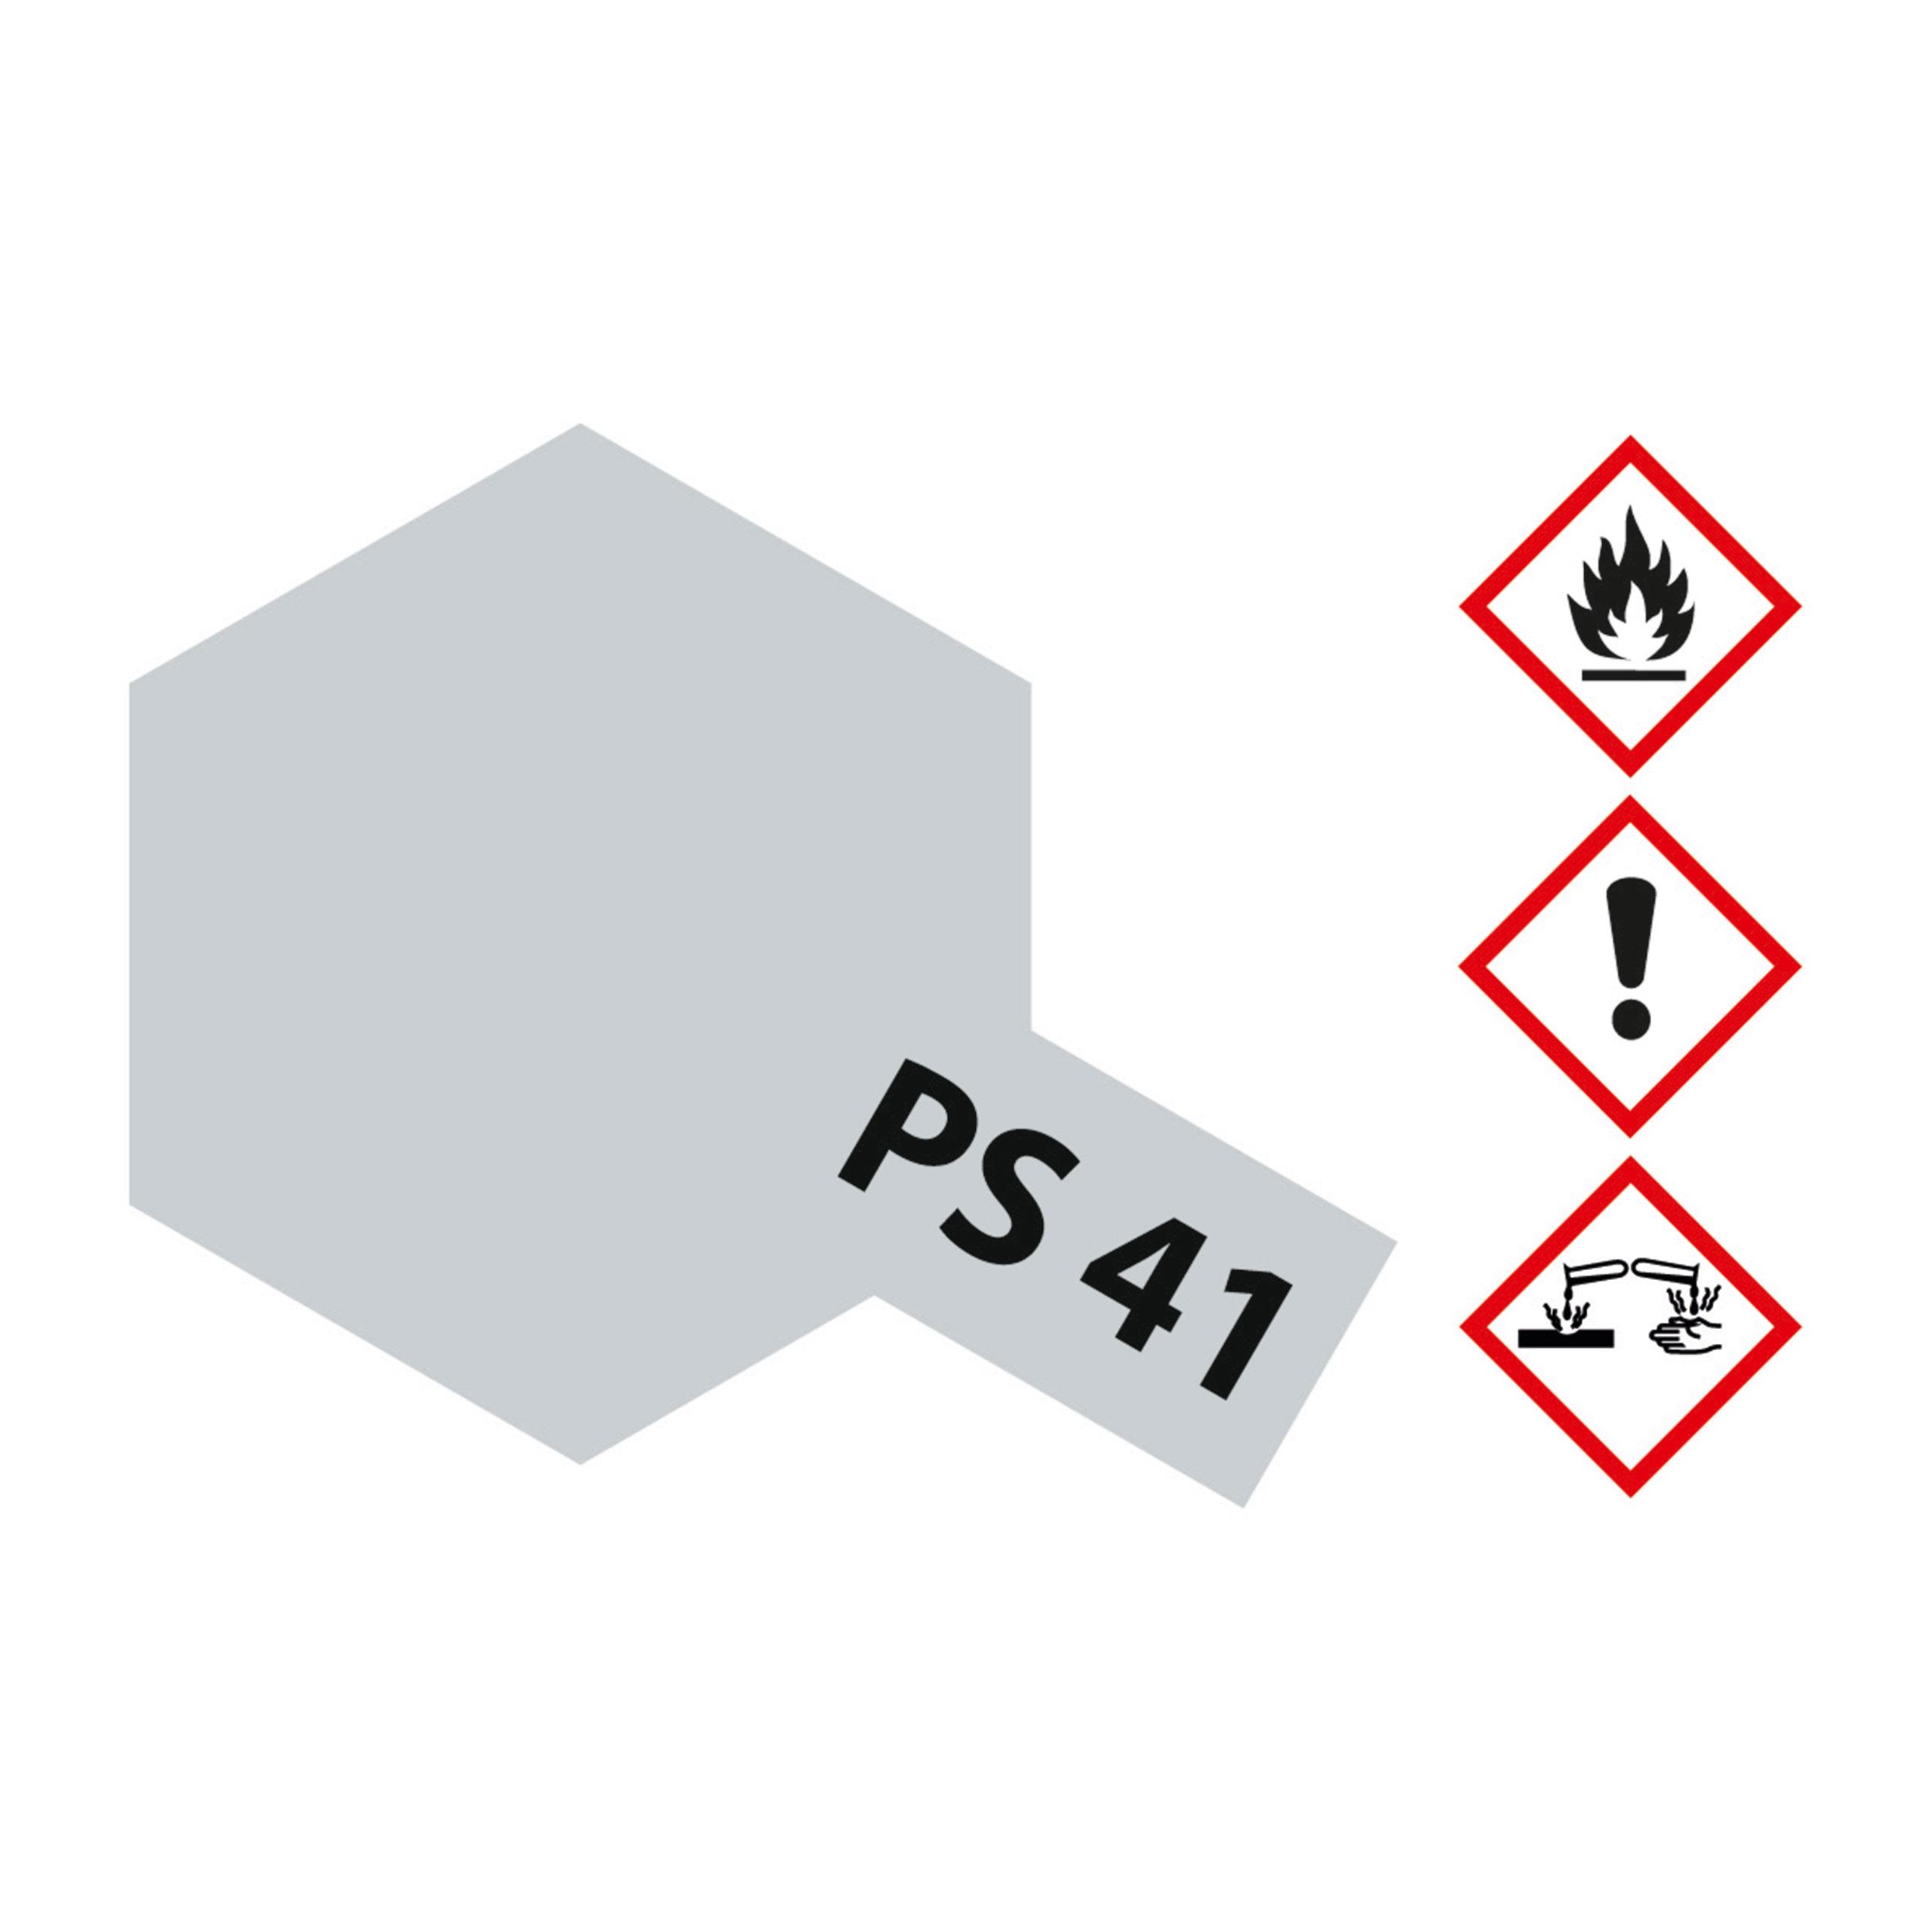 PS-41 Hellsilber Polycarbonat - 100ml Sprayfarbe Lexan - Tamiya 300086041